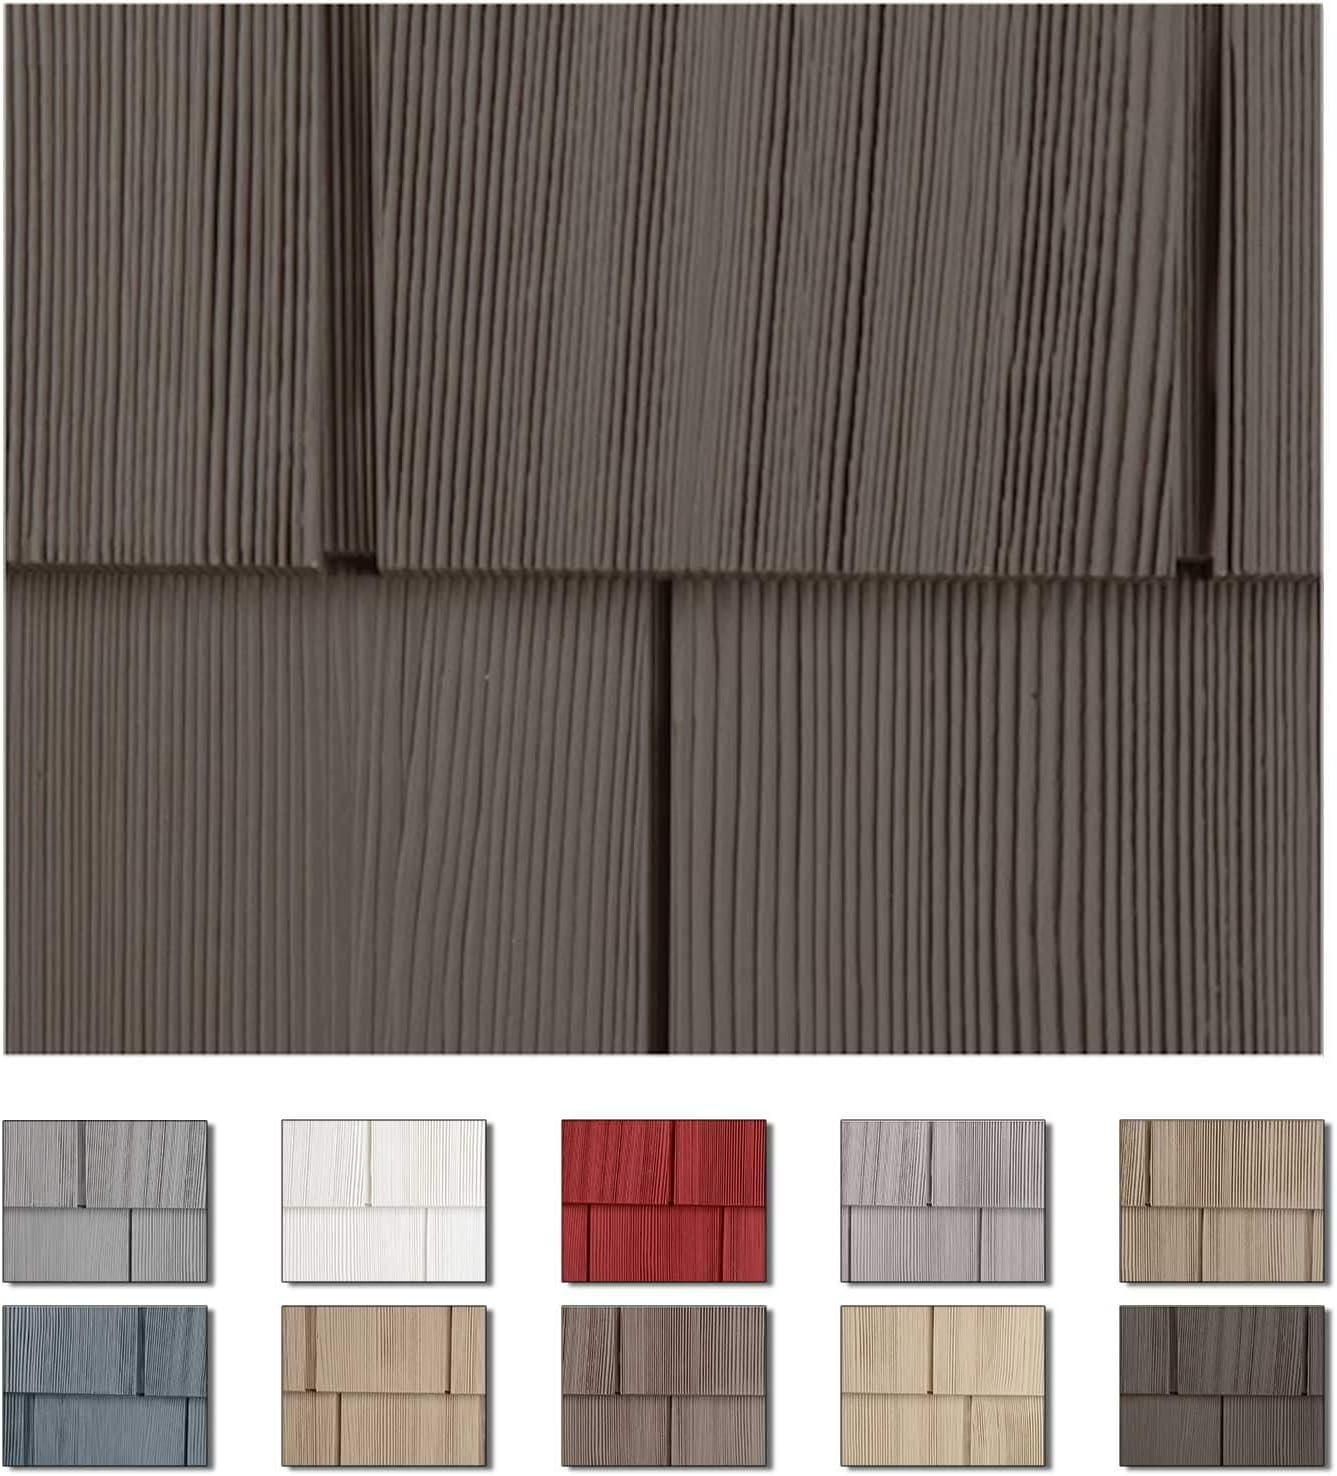 Homeside Select Double 7in. Cedar Shake Vinyl Siding (1/2 Square) Slate